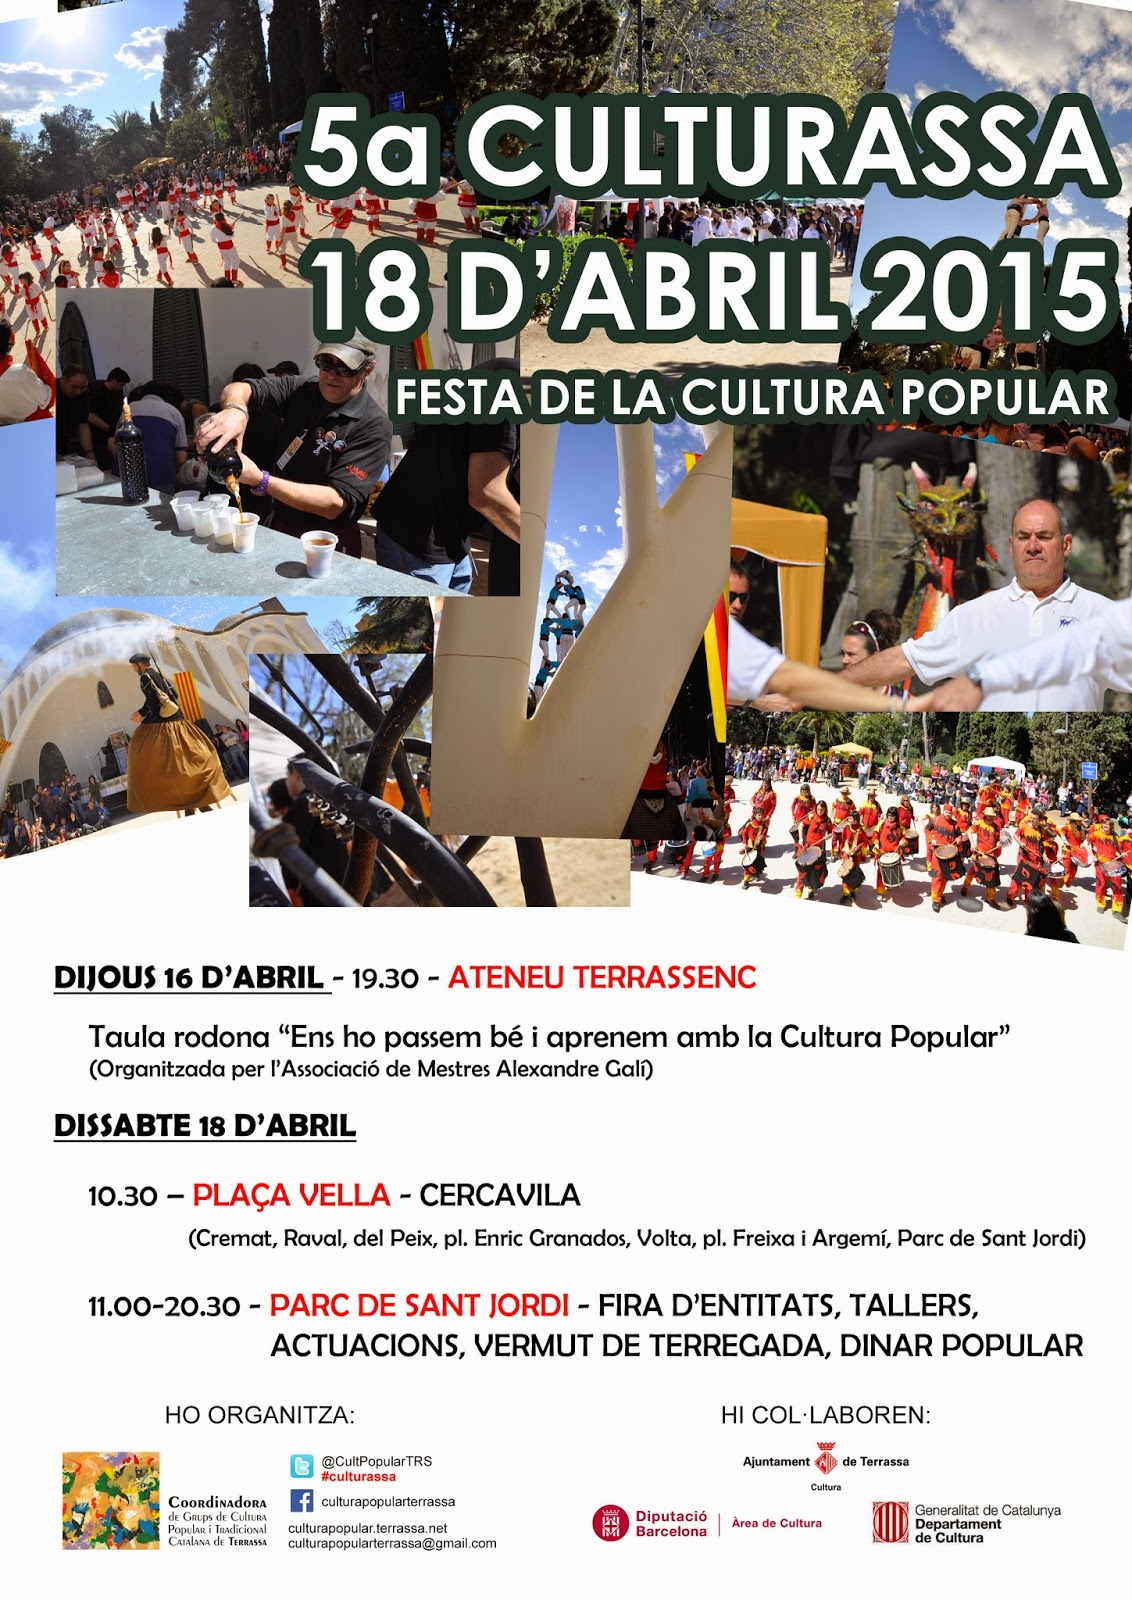 Culturassa 2015 Terrassa